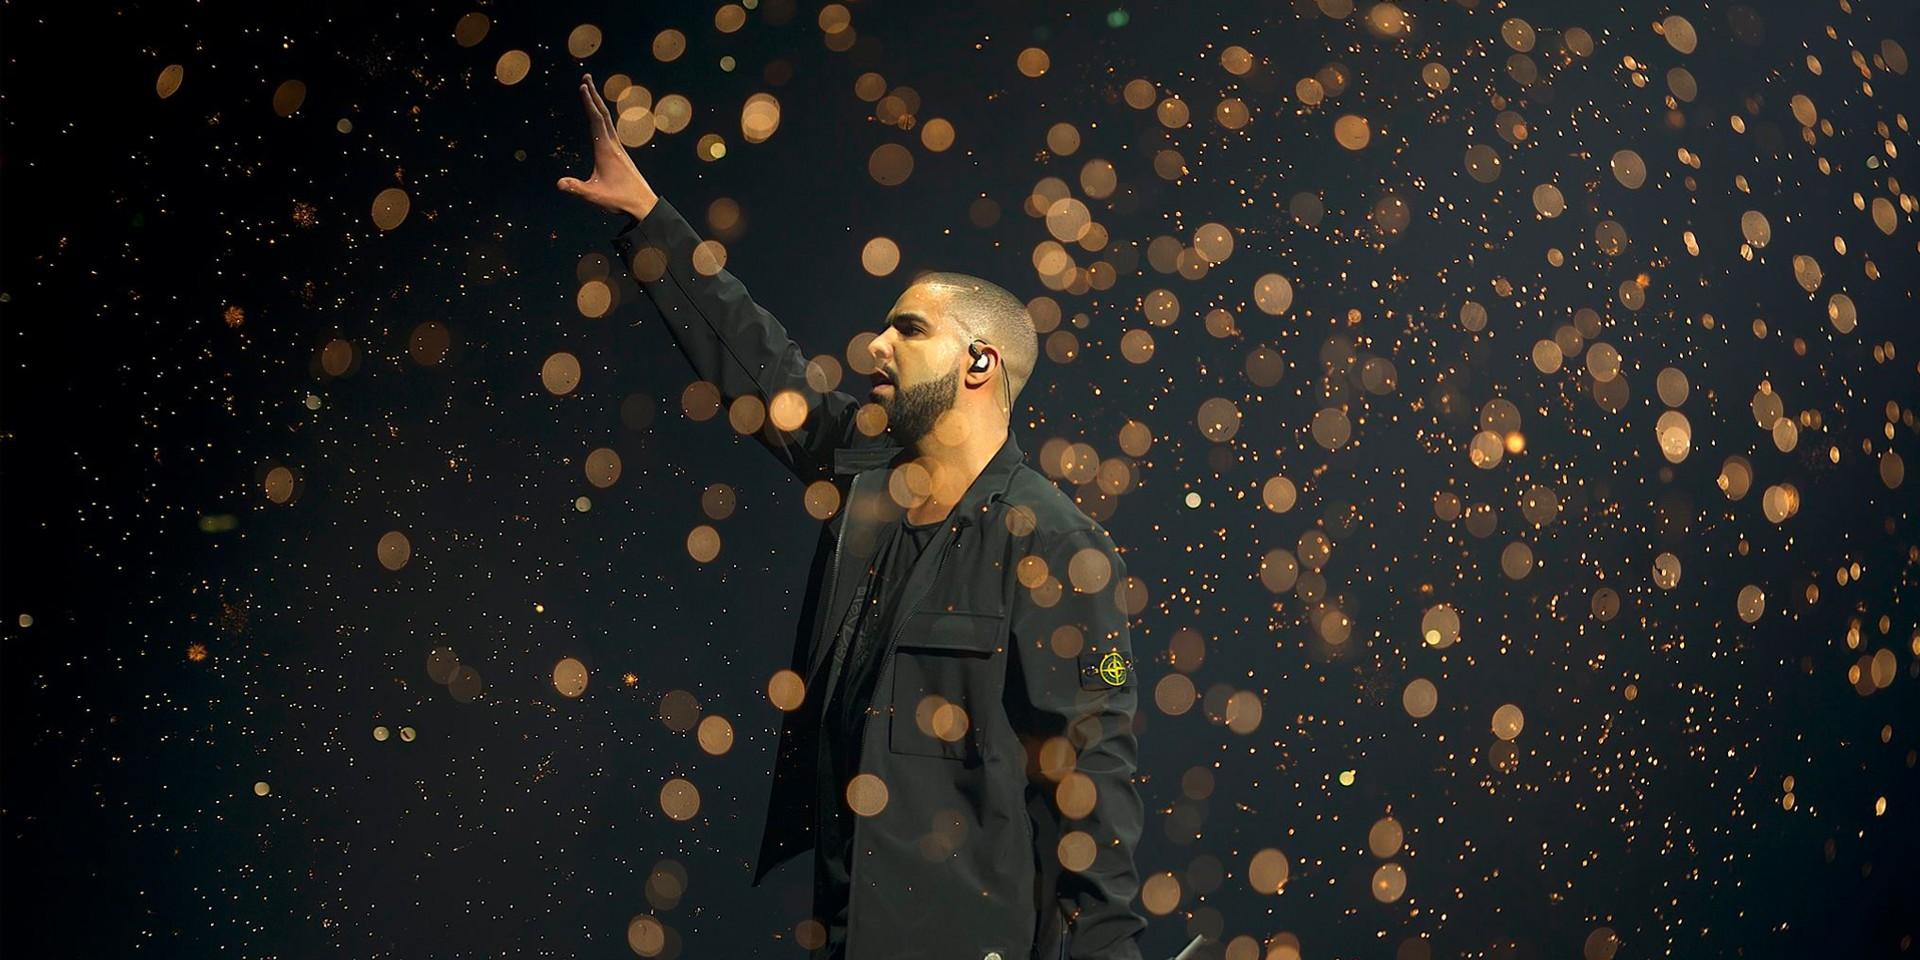 Drake's new album, Scorpion, is streaming now – listen